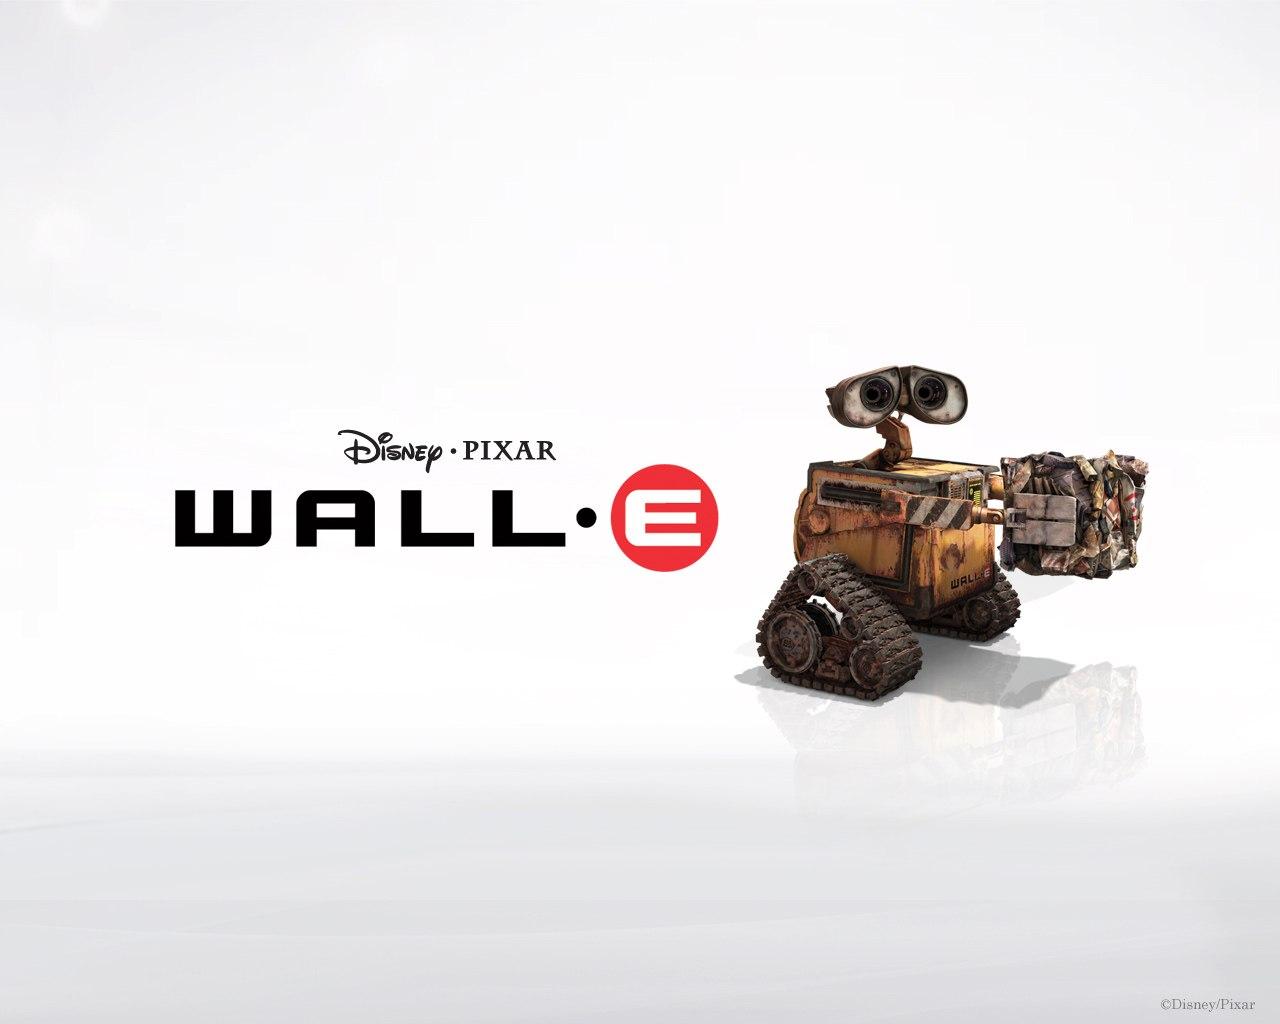 http://thebrandbuilder.files.wordpress.com/2008/06/wall-e-pixar-1489.jpg